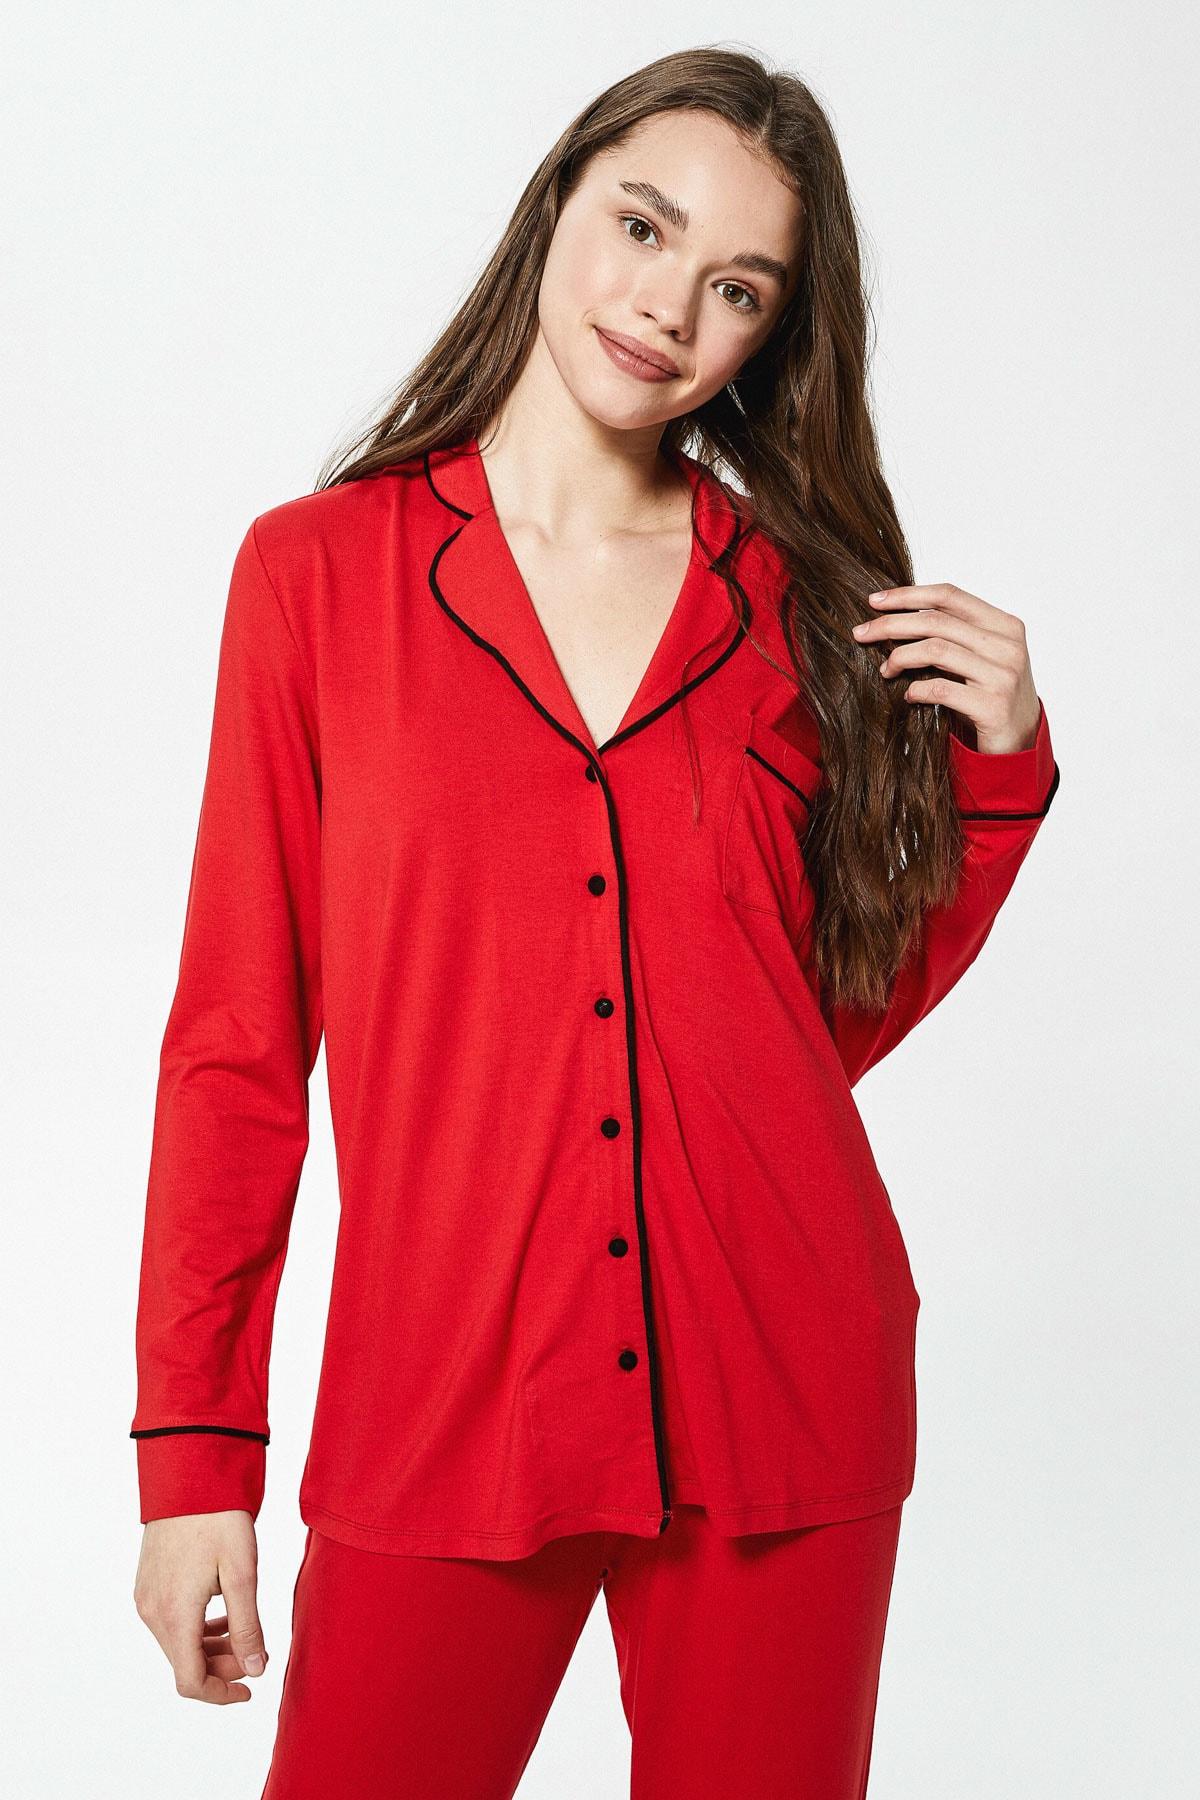 LC Waikiki Kadın Canlı Kırmızı LCW DREAM Pijama Takım 2